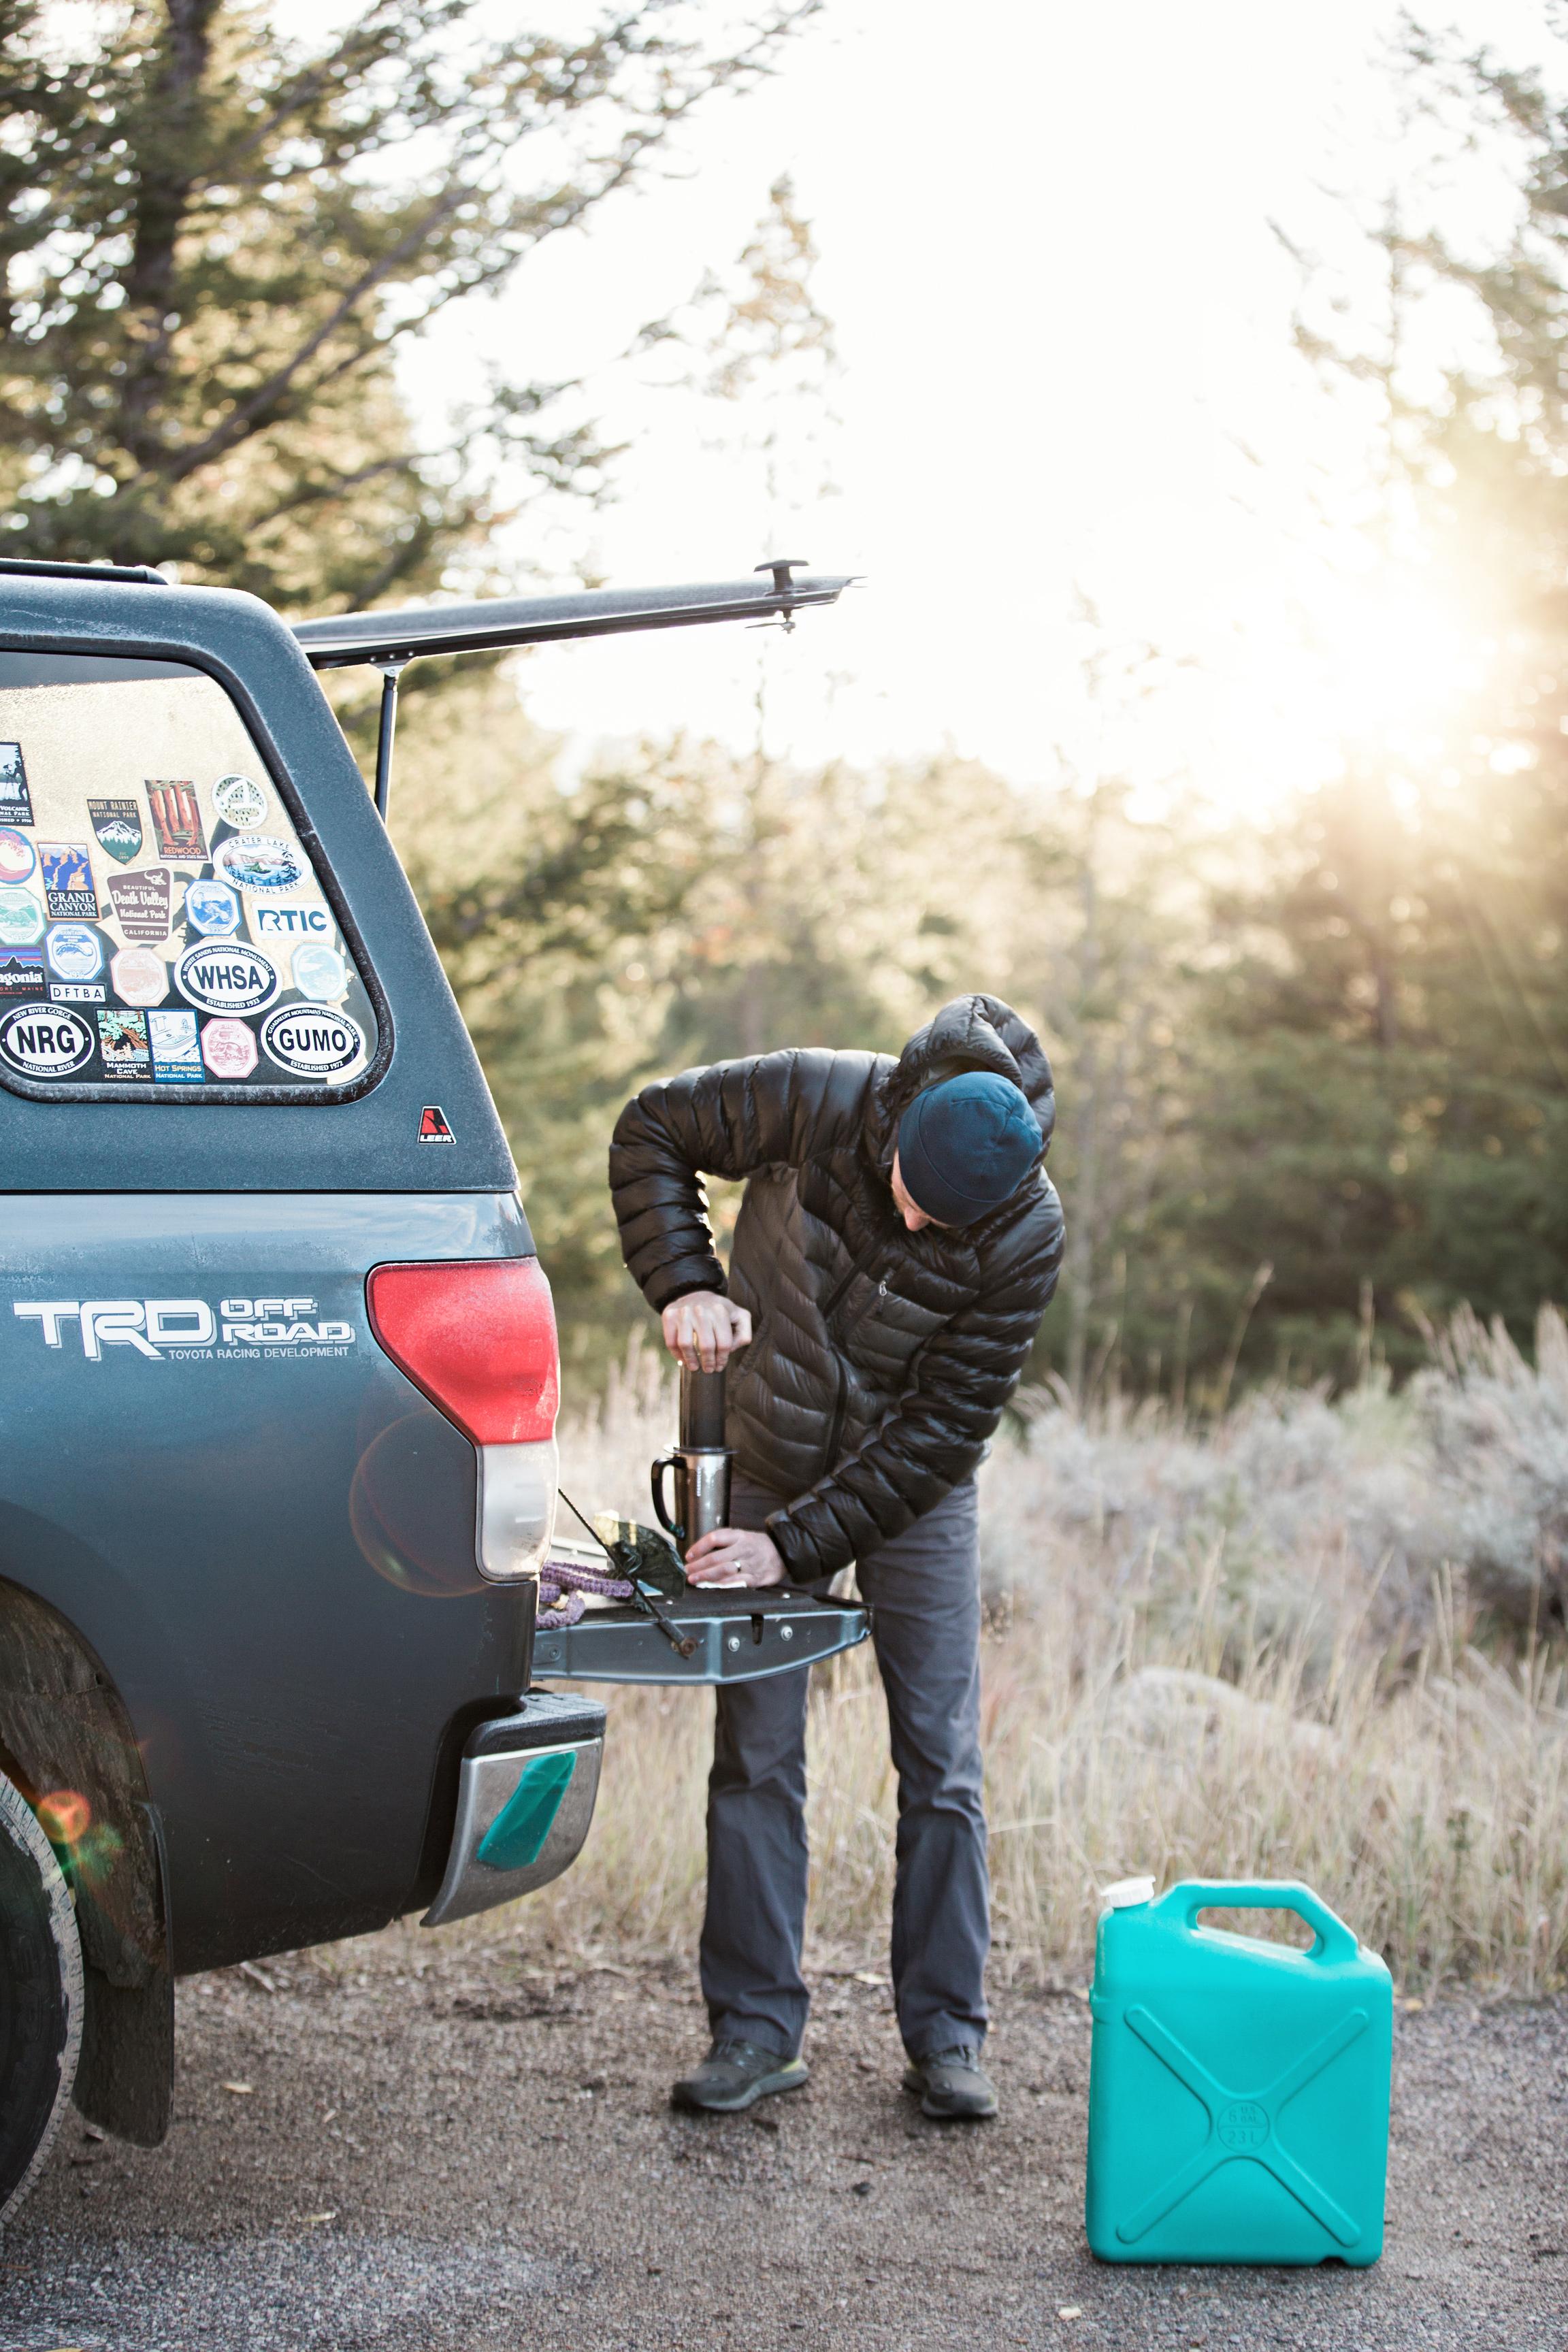 CindyGiovagnoli_outdoor_adventure_photography_Grand_Teton_Yellowstone_Glacier_National_Park_Montana_Wyoming_South_Dakota_Mount_Rushmore_Badlands-002.jpg